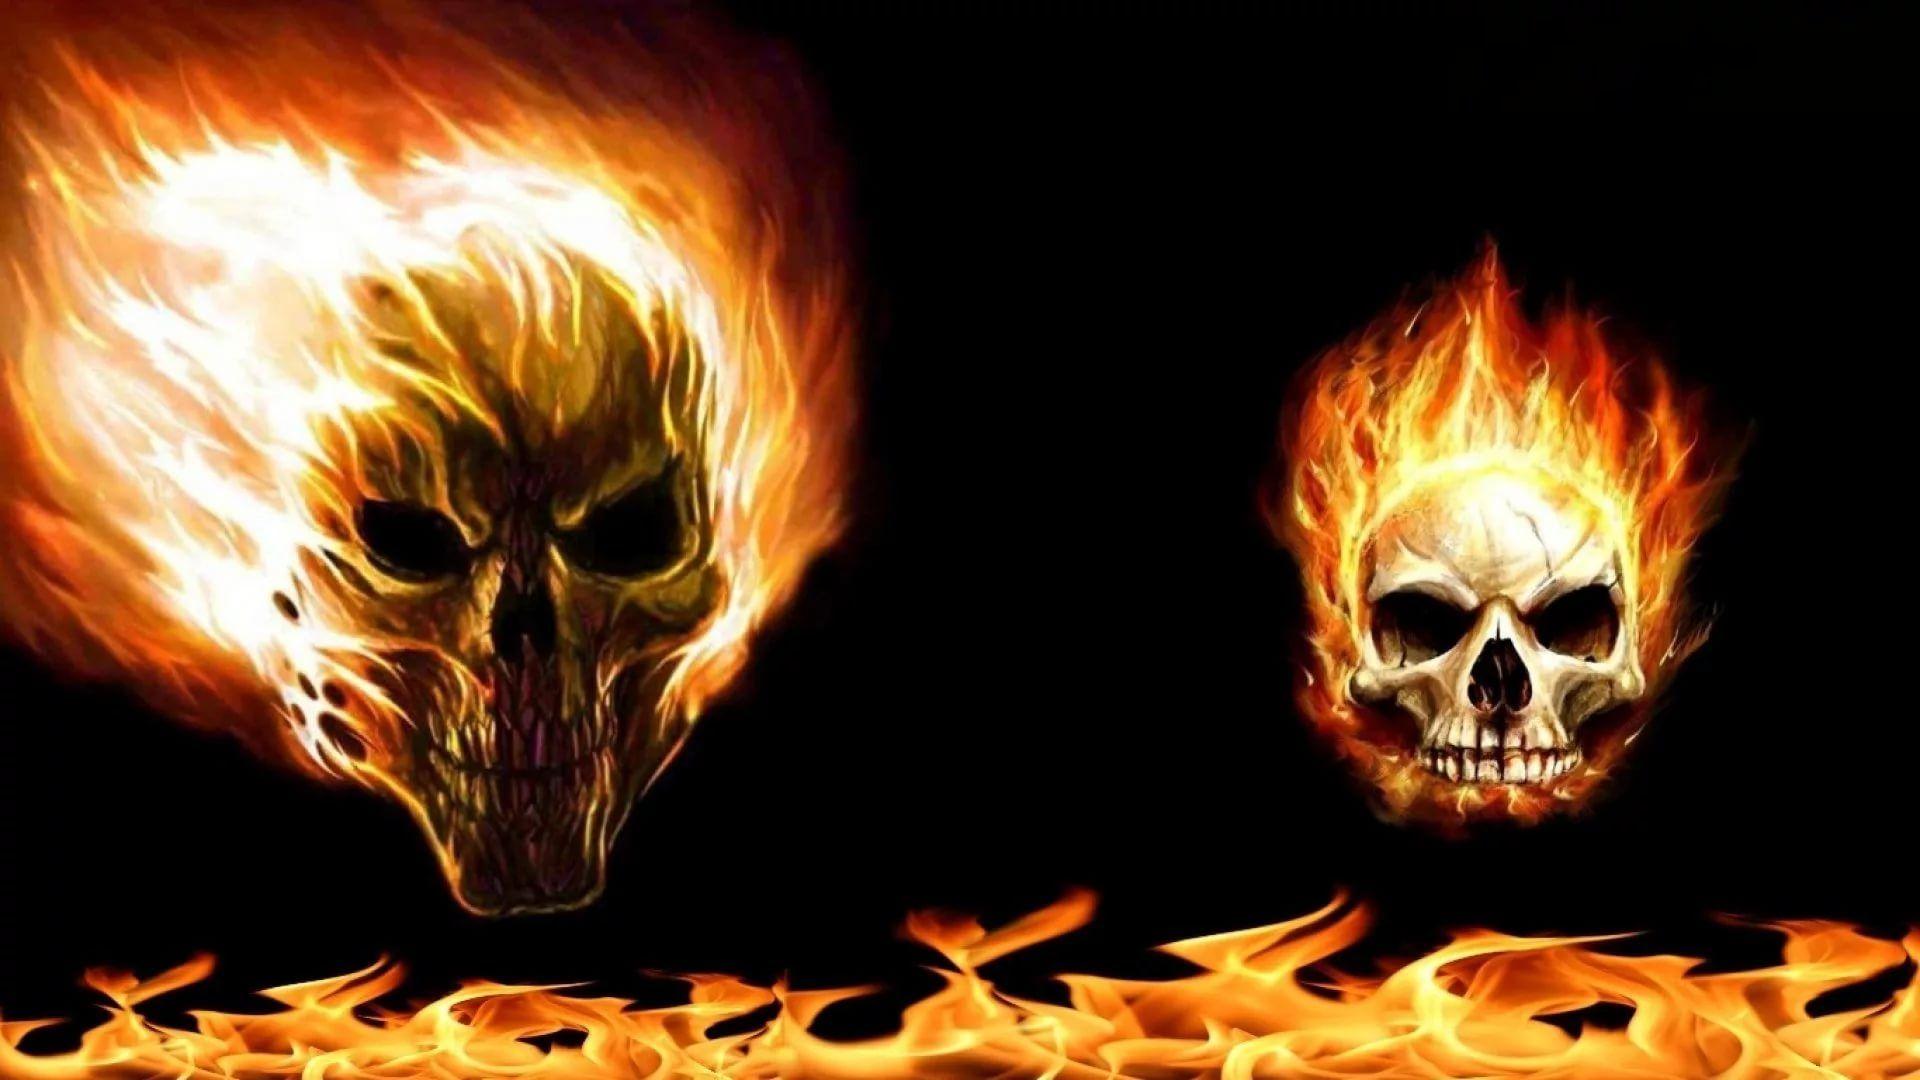 Flaming Skull Background Wallpaper HD